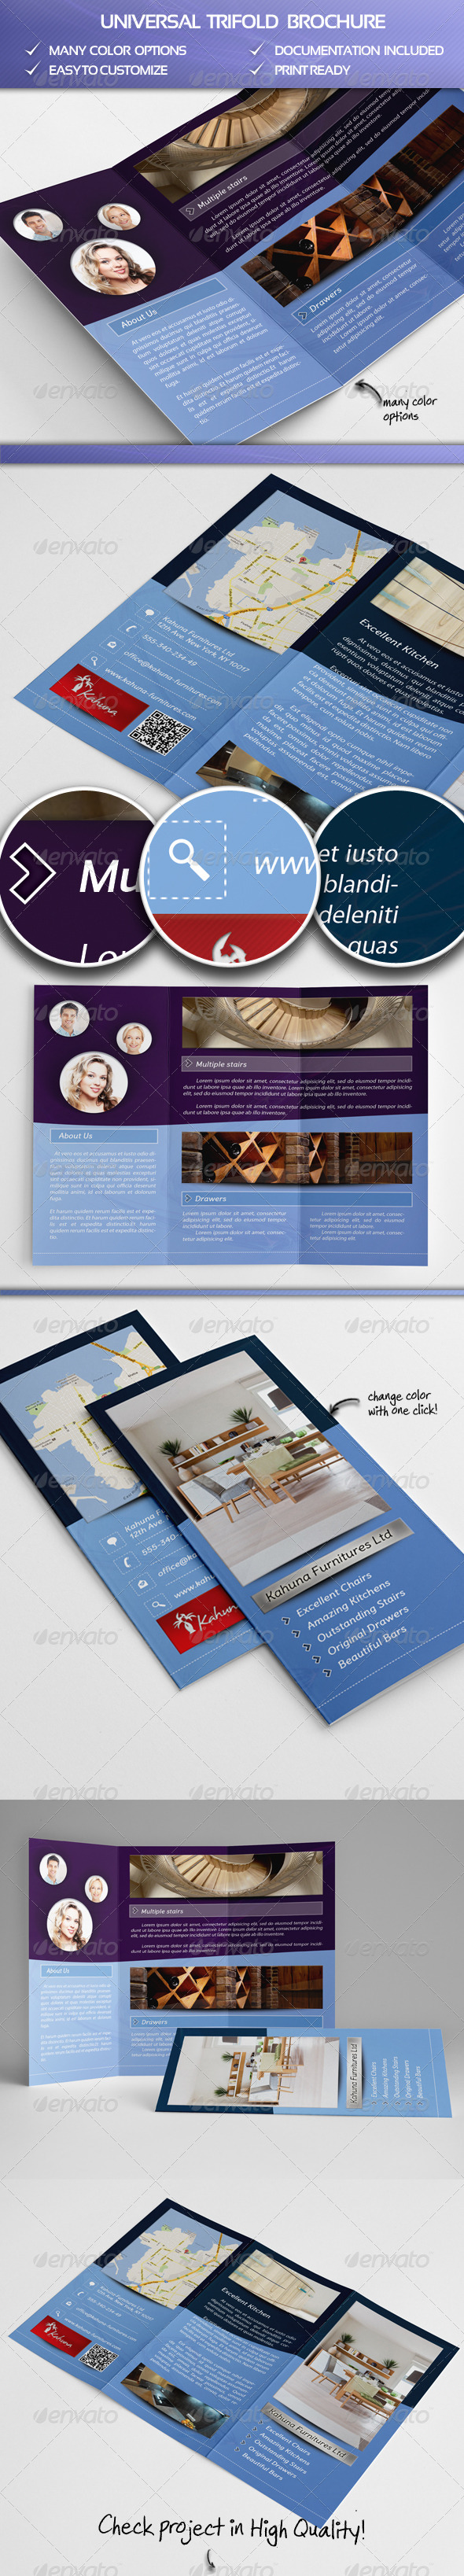 Universal Trifold Brochure - Portfolio Brochures